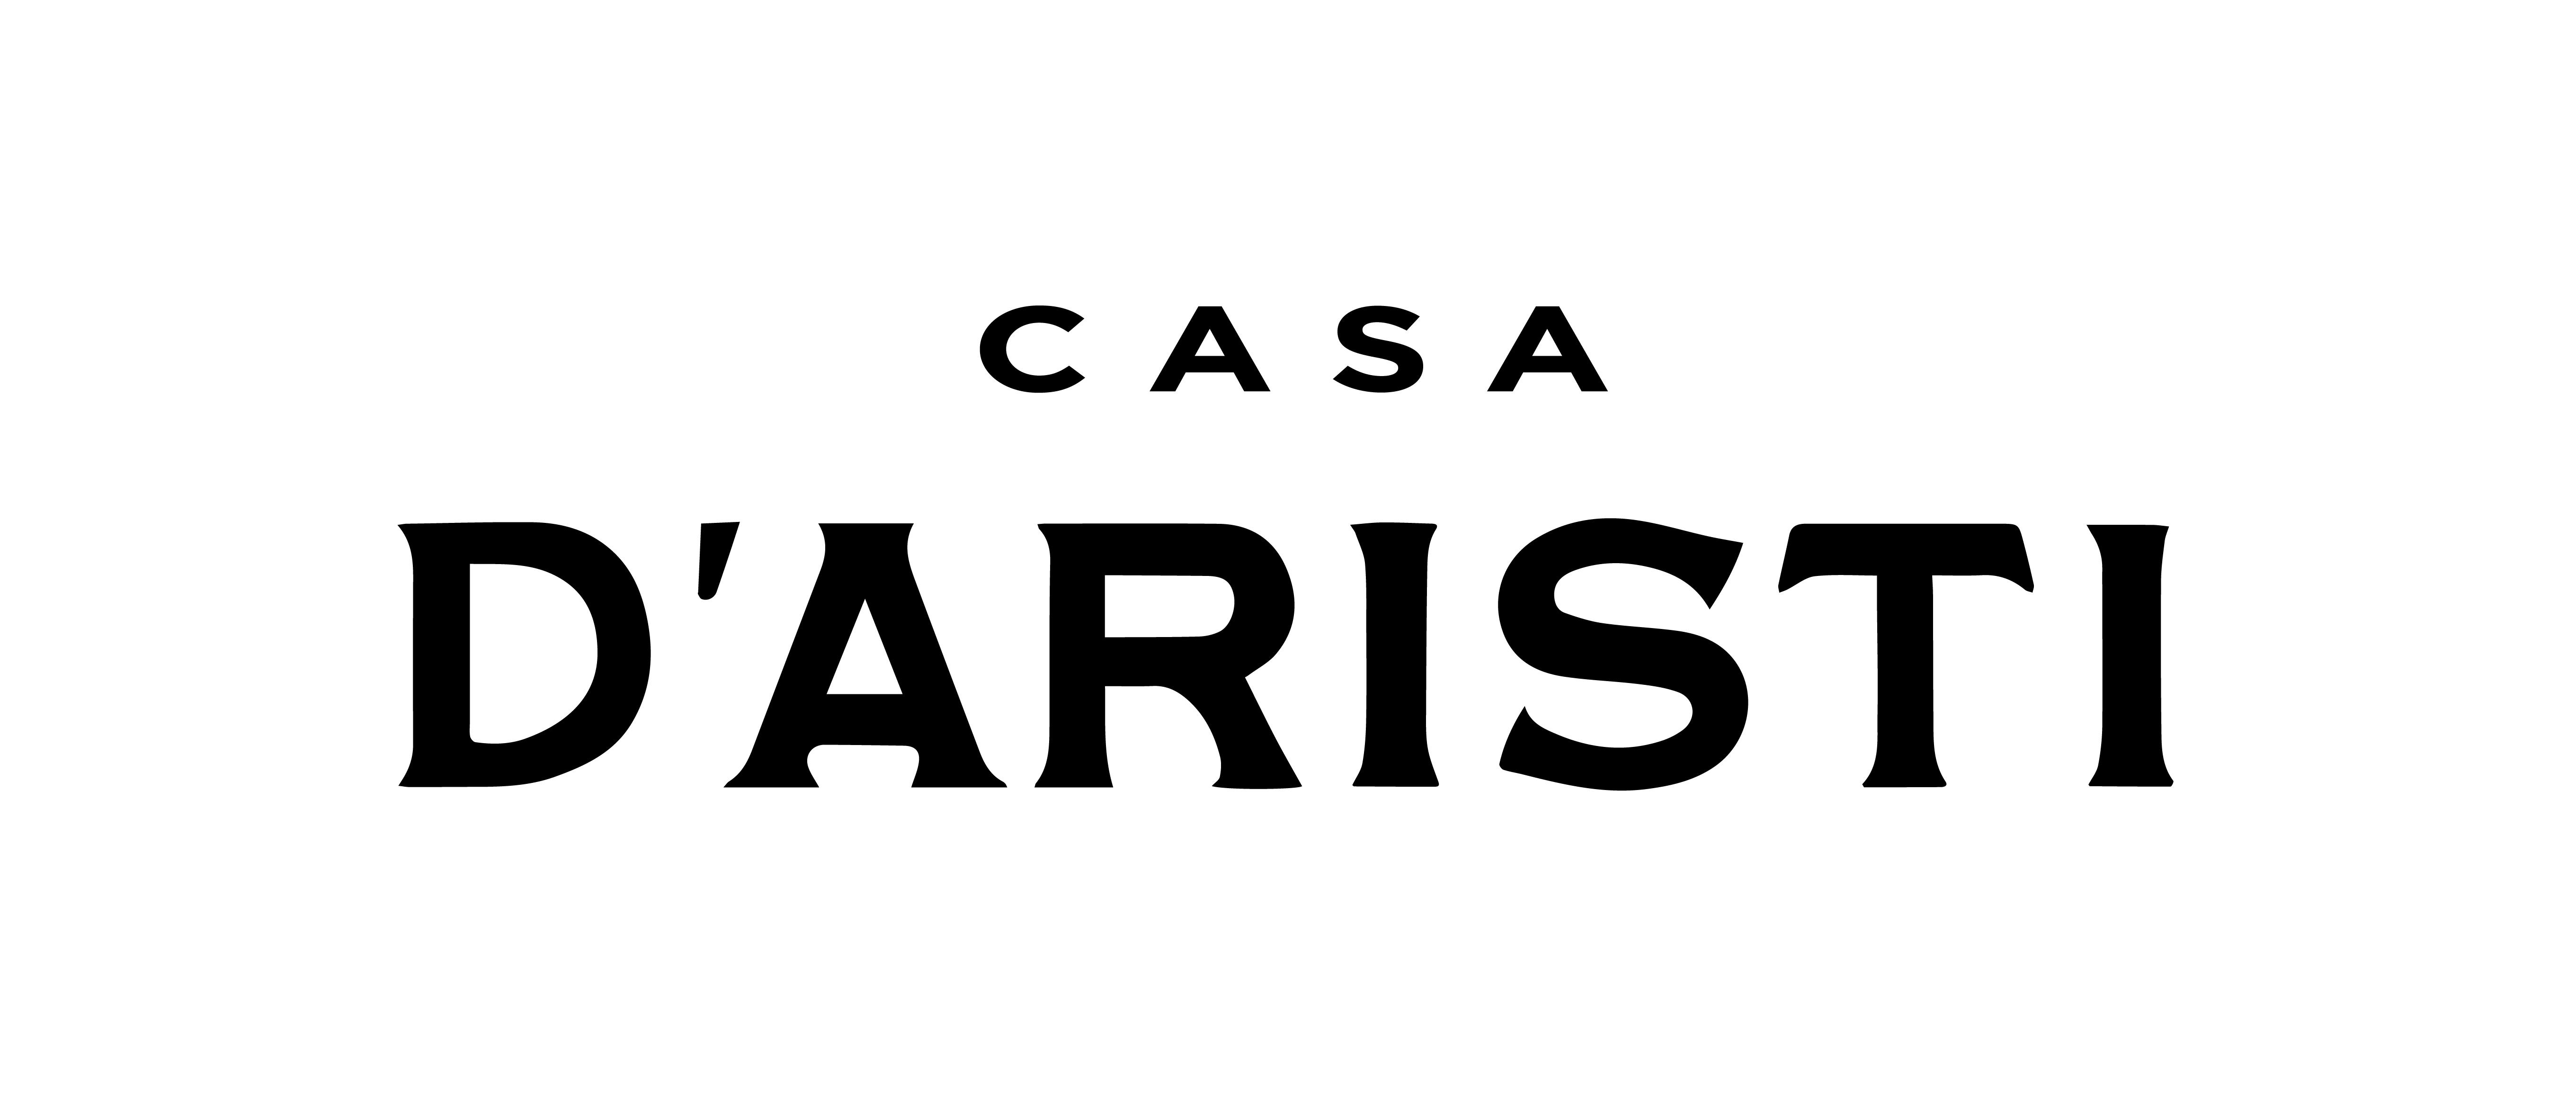 CASA D'ARISTI